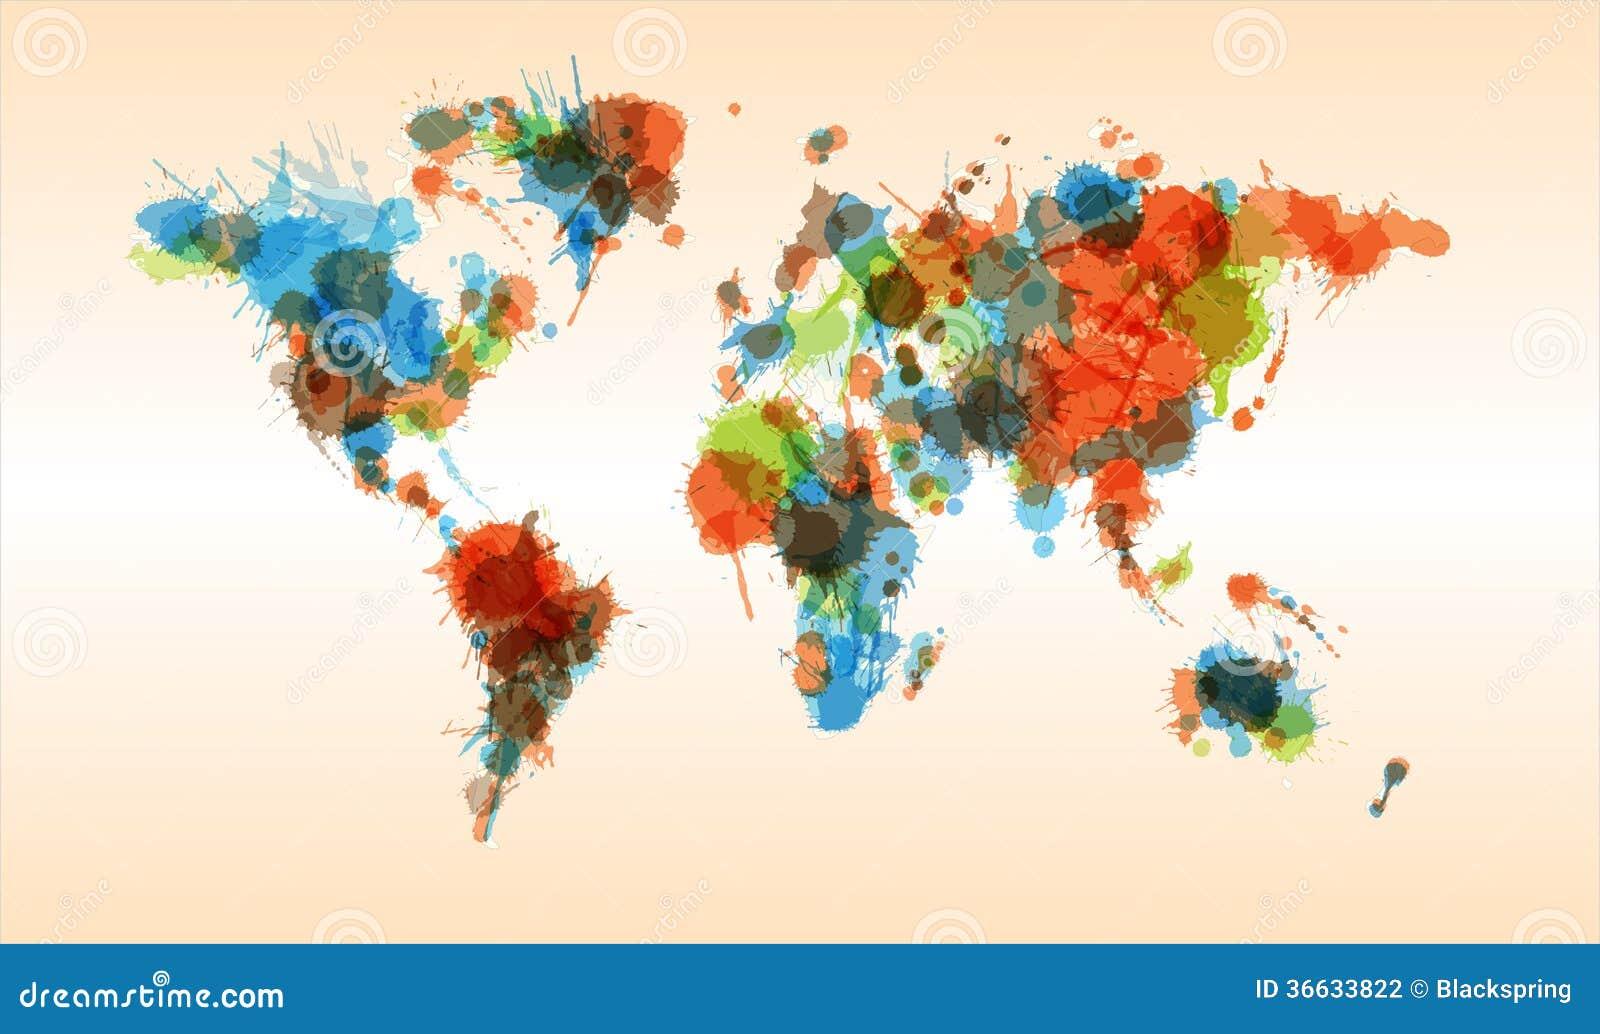 grunge colorful world map stock vector image of retro. Black Bedroom Furniture Sets. Home Design Ideas